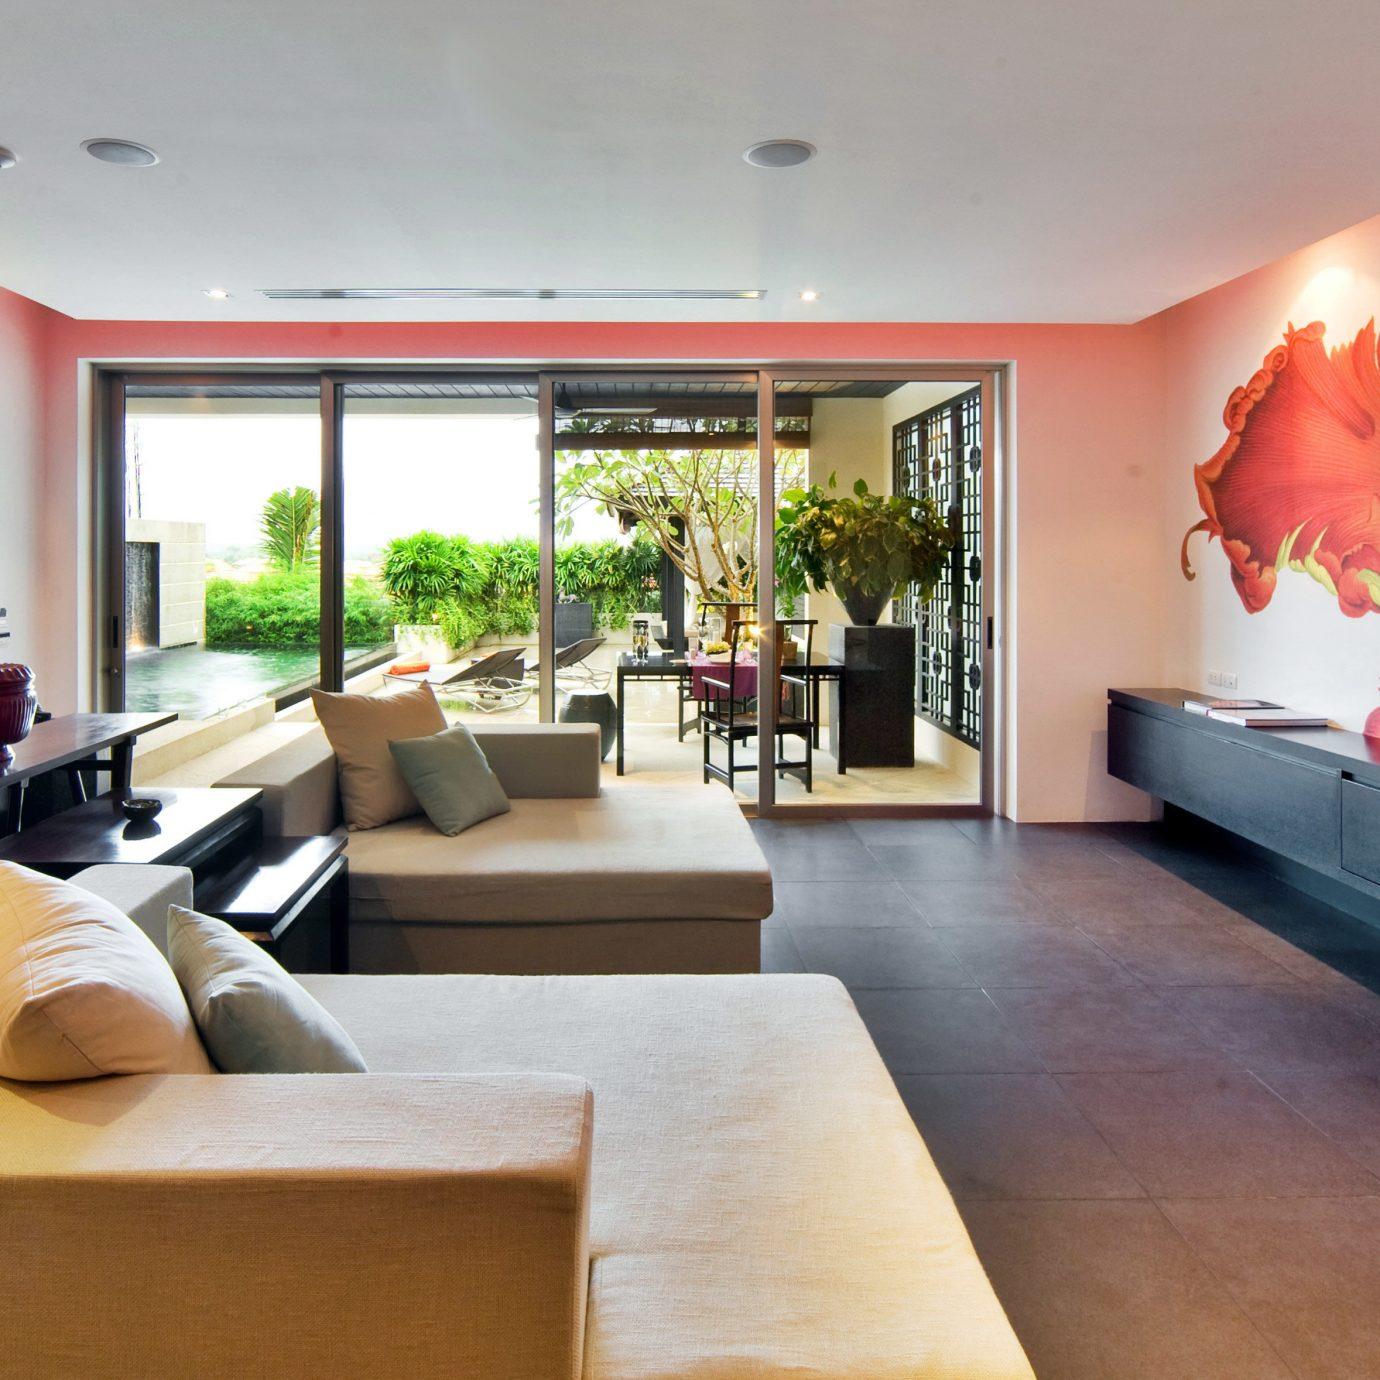 Beachfront Luxury Modern Suite sofa property living room home condominium flat Lobby